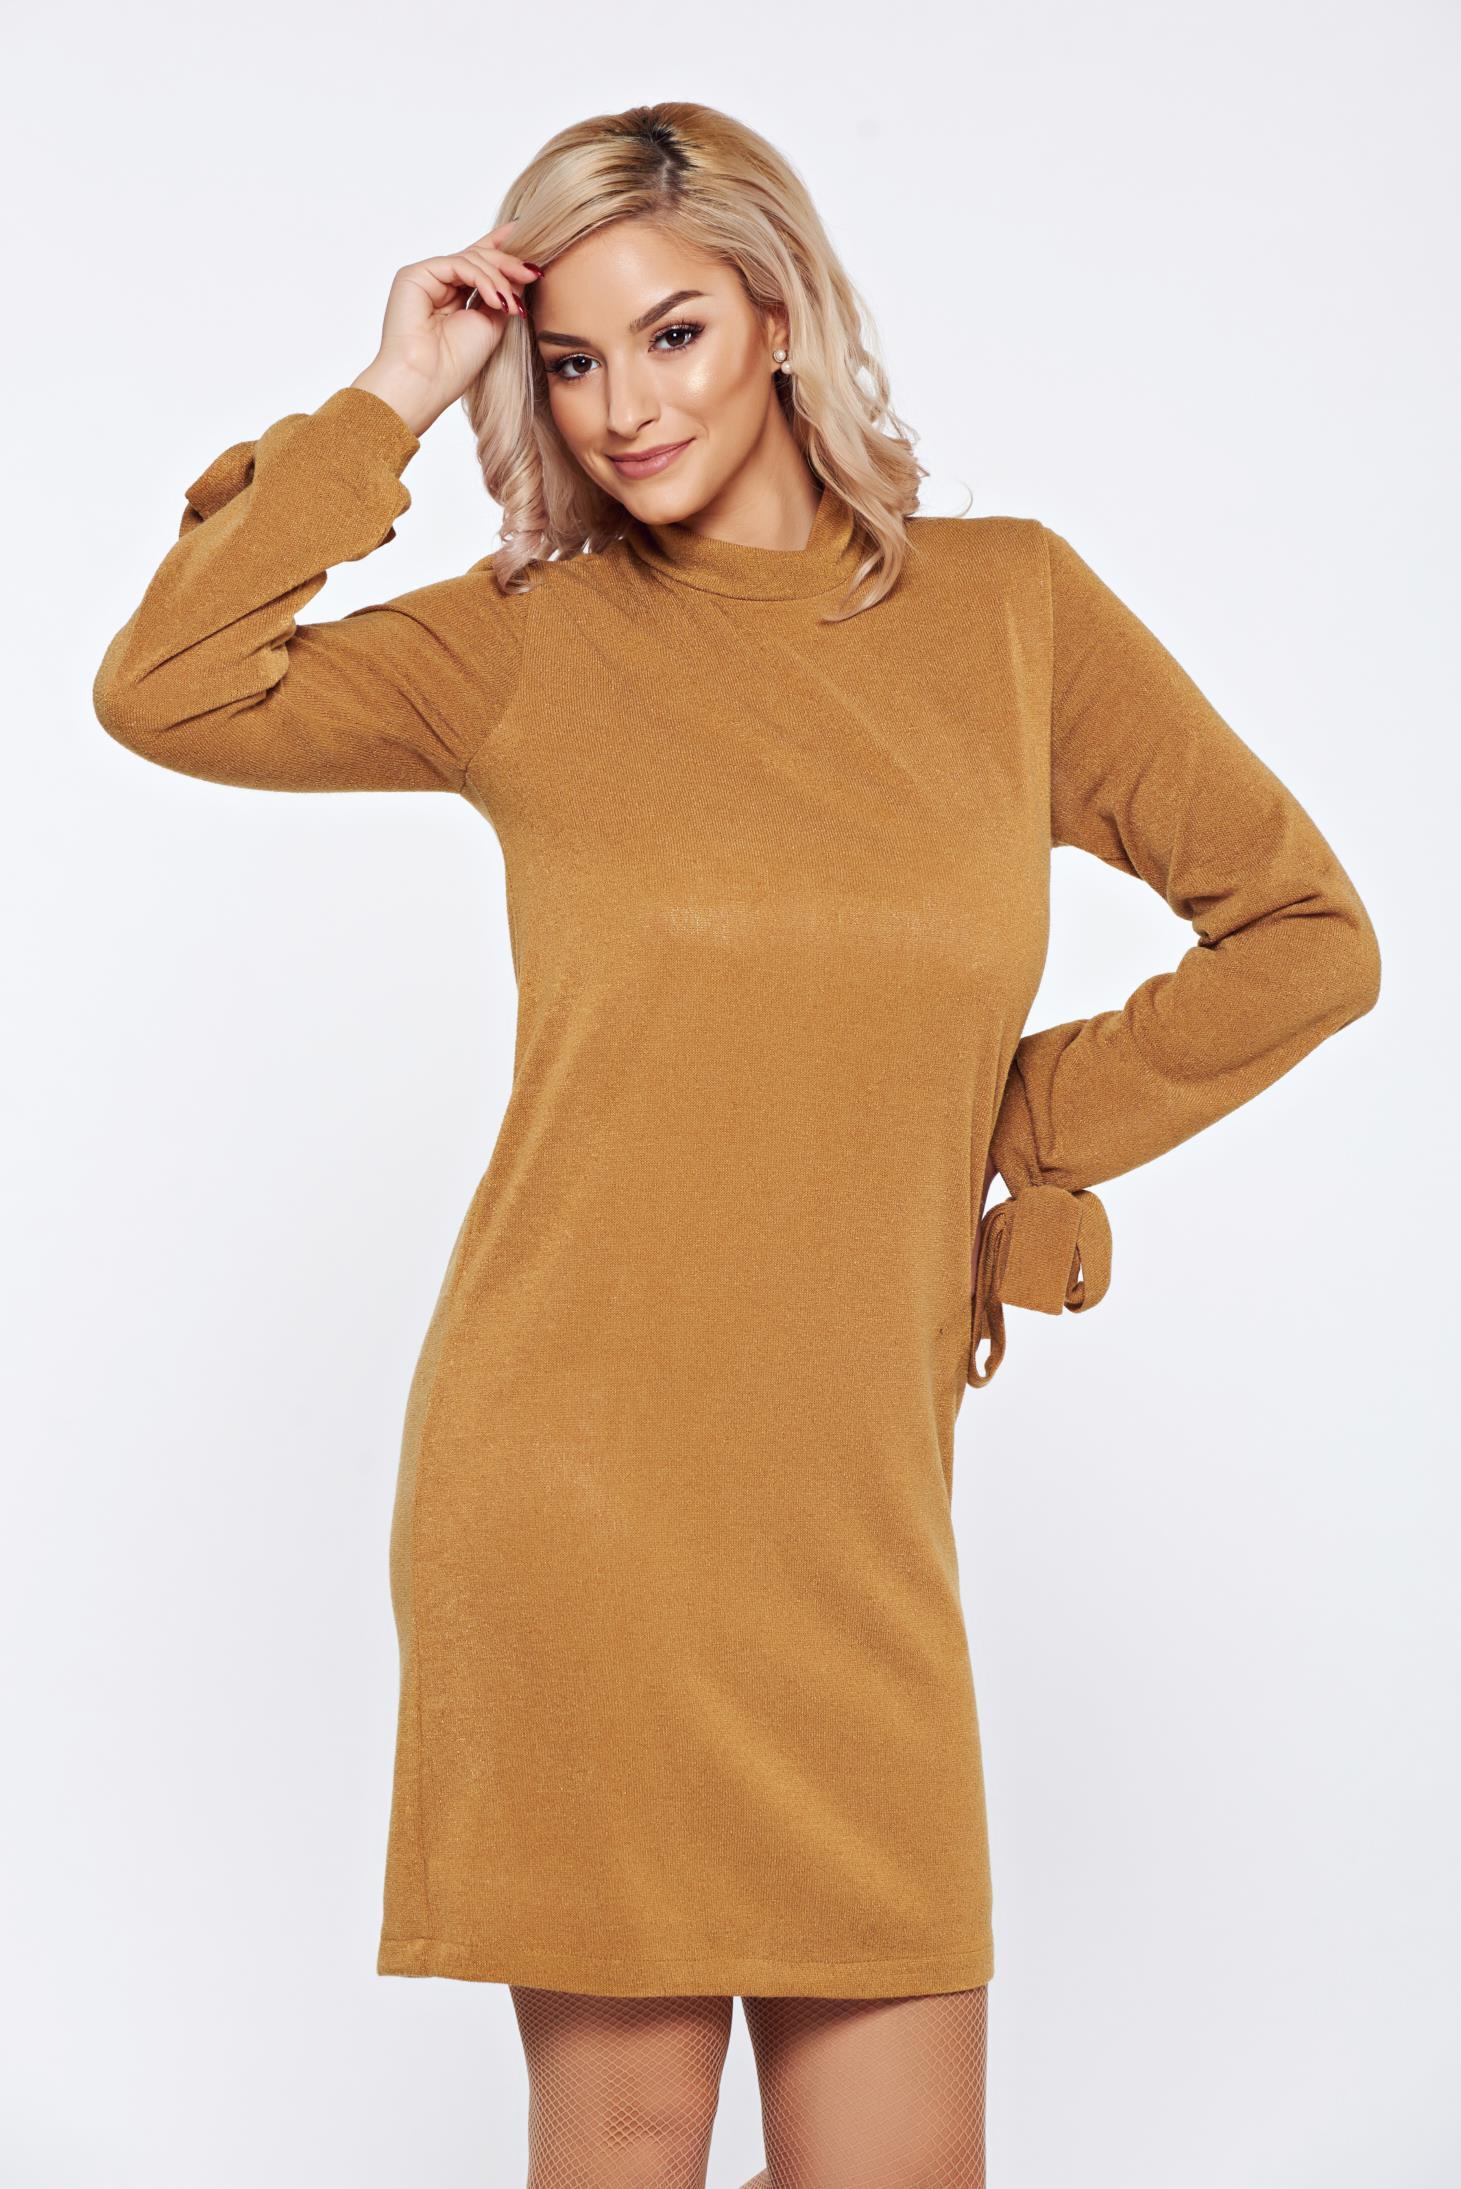 Rochie StarShinerS mustarie de zi tricotata cu croi larg captusita pe interior